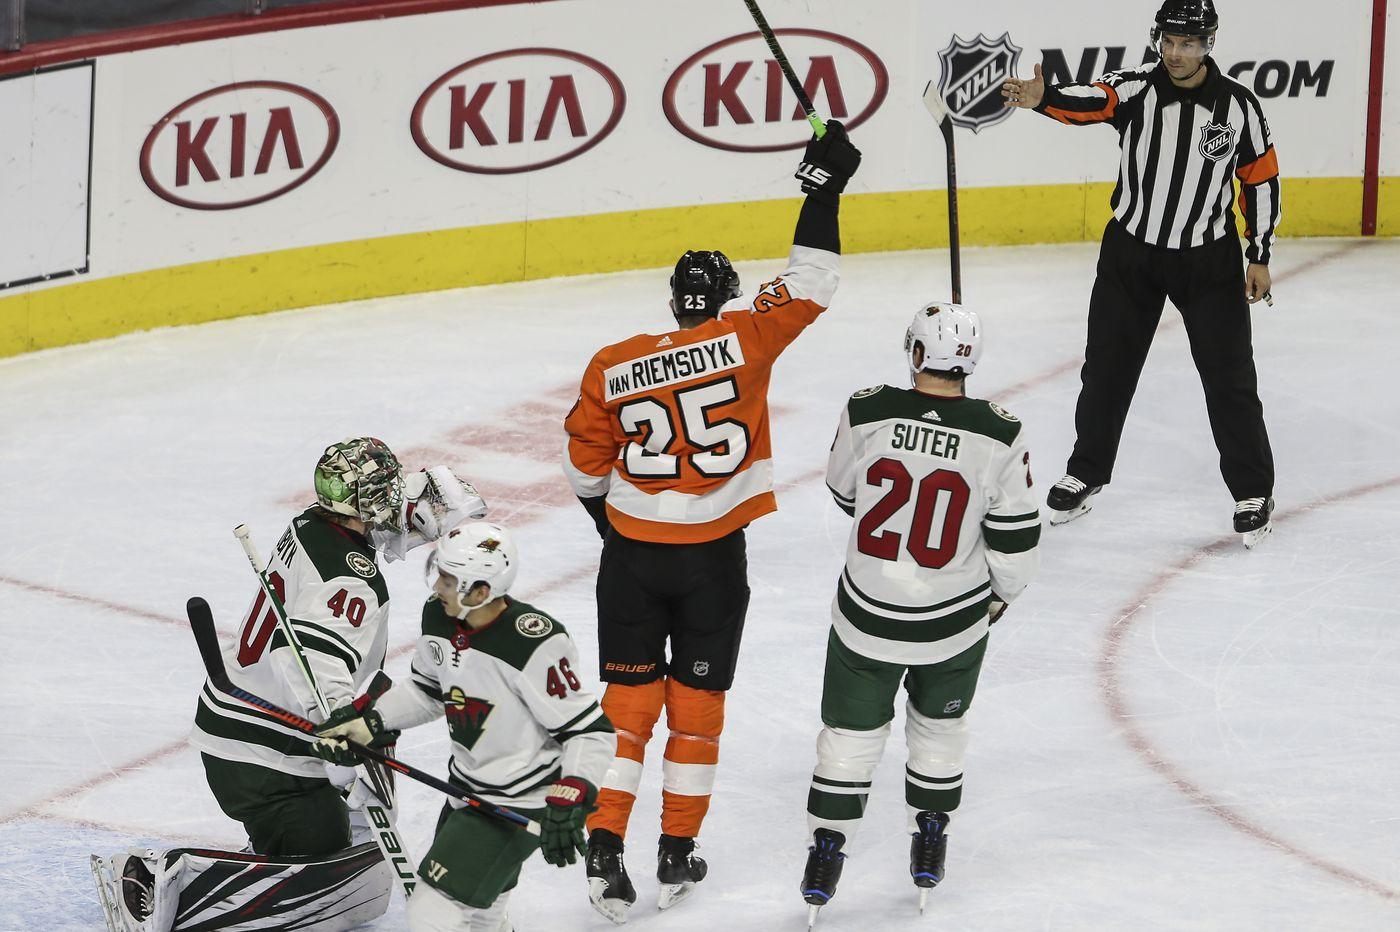 Nolan Patrick snaps slump, James van Riemsdyk scores hat trick as Flyers rally past Wild